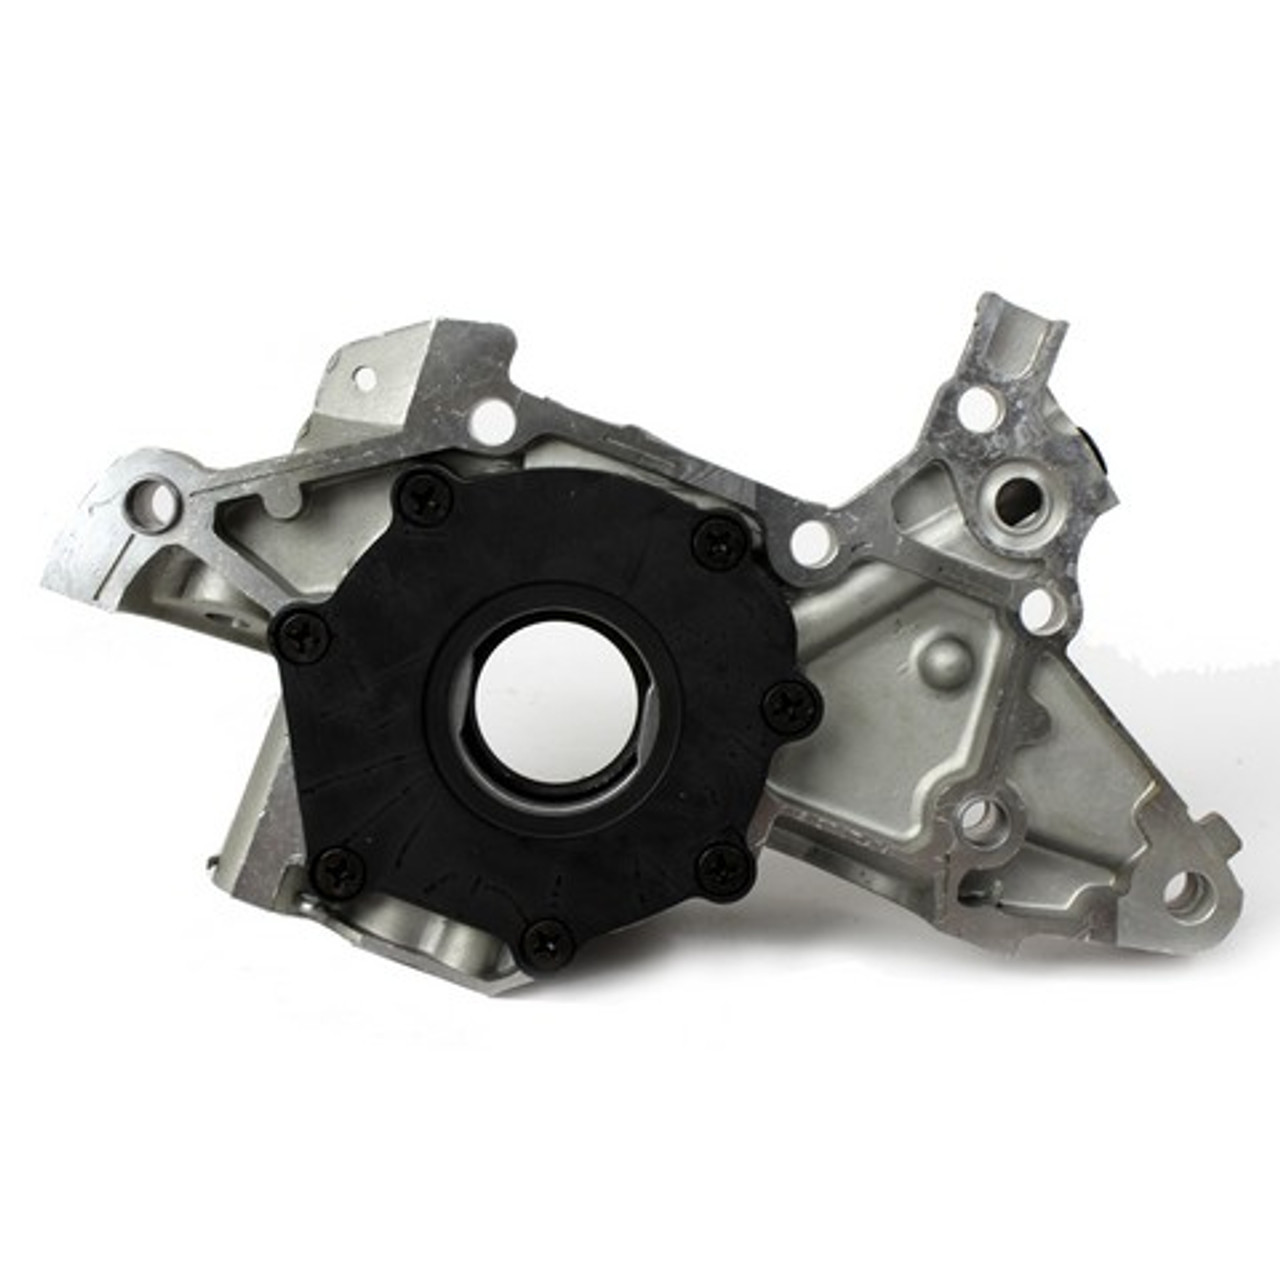 DNJ OP490 Oil Pump For 90-98 Ford Mazda Mercury Capri 1.5L 1.6L 1.8L DOHC SOHC